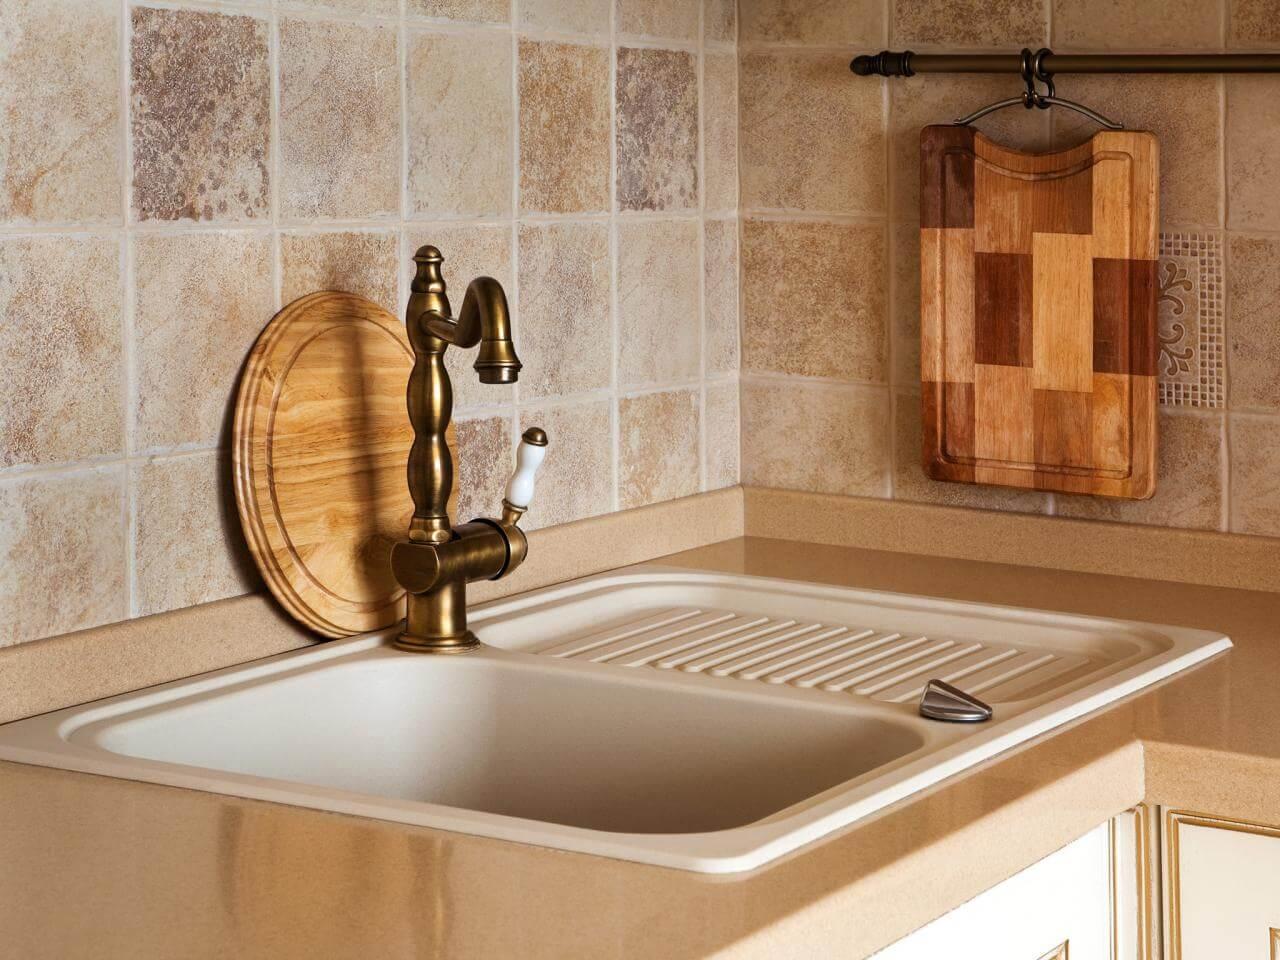 Stylish sink